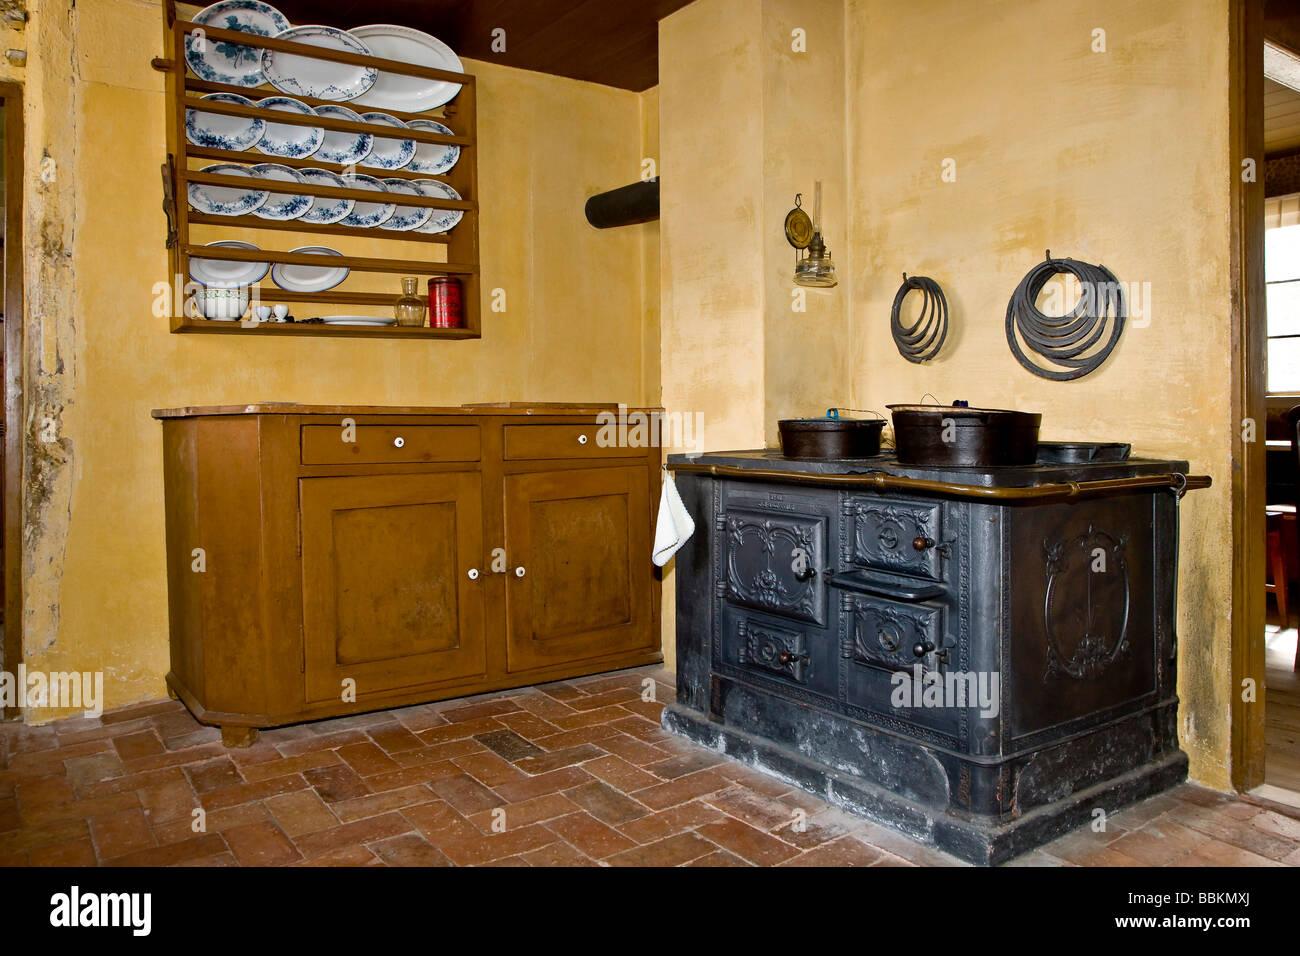 Old kitchen interior - Stock Image